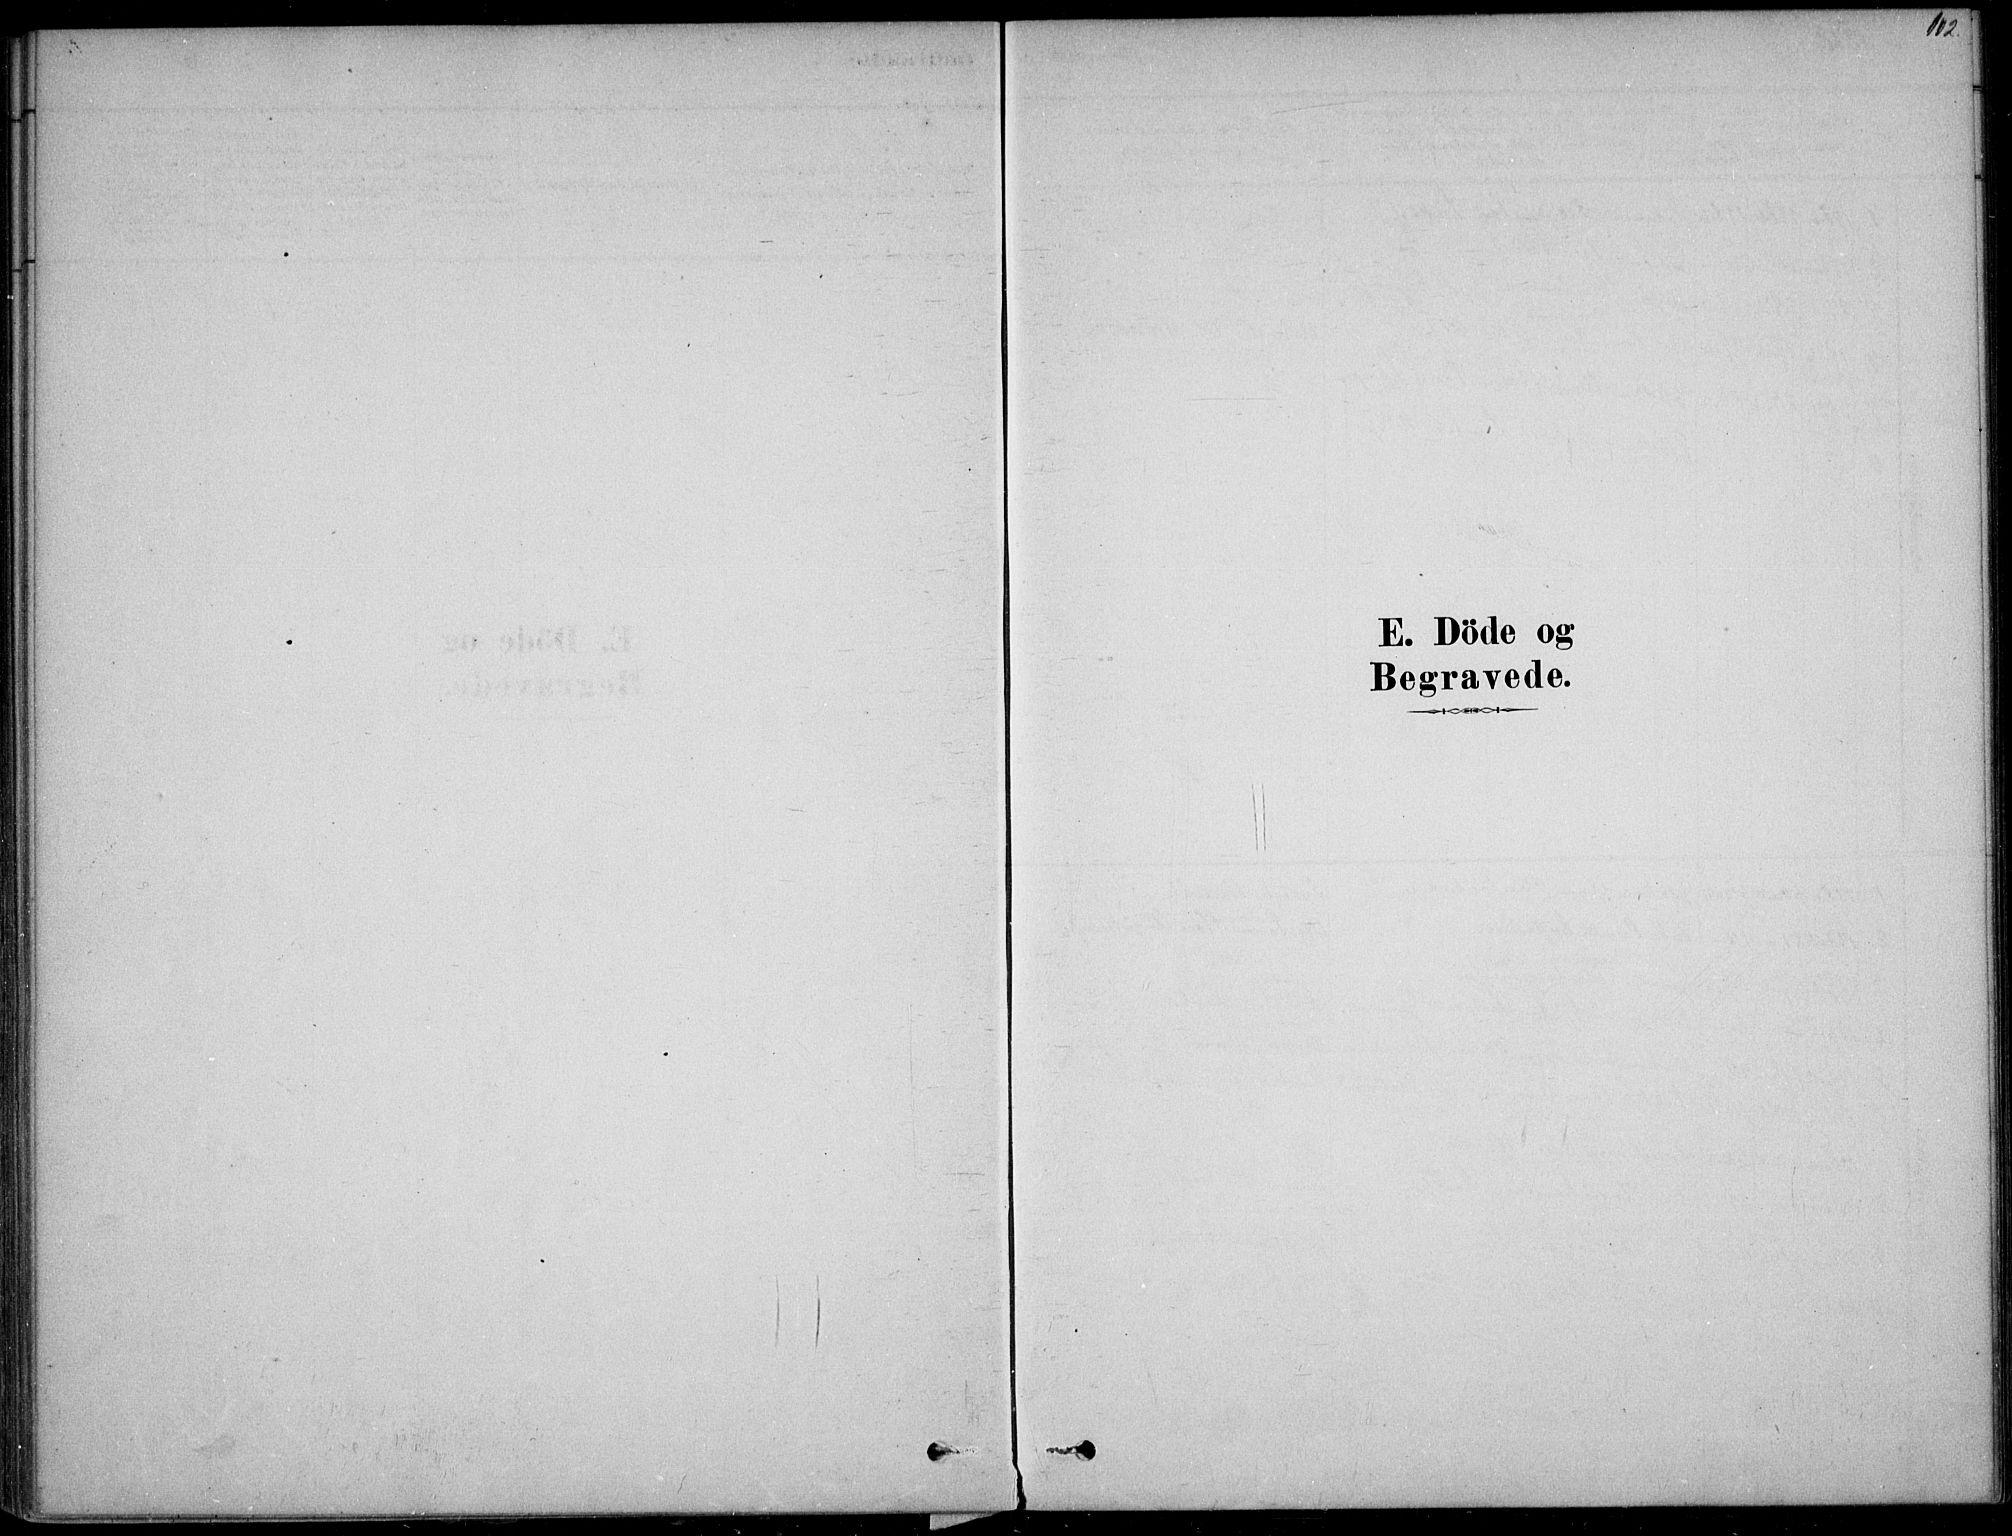 SAKO, Langesund kirkebøker, F/Fa/L0002: Ministerialbok nr. 2, 1878-1892, s. 102